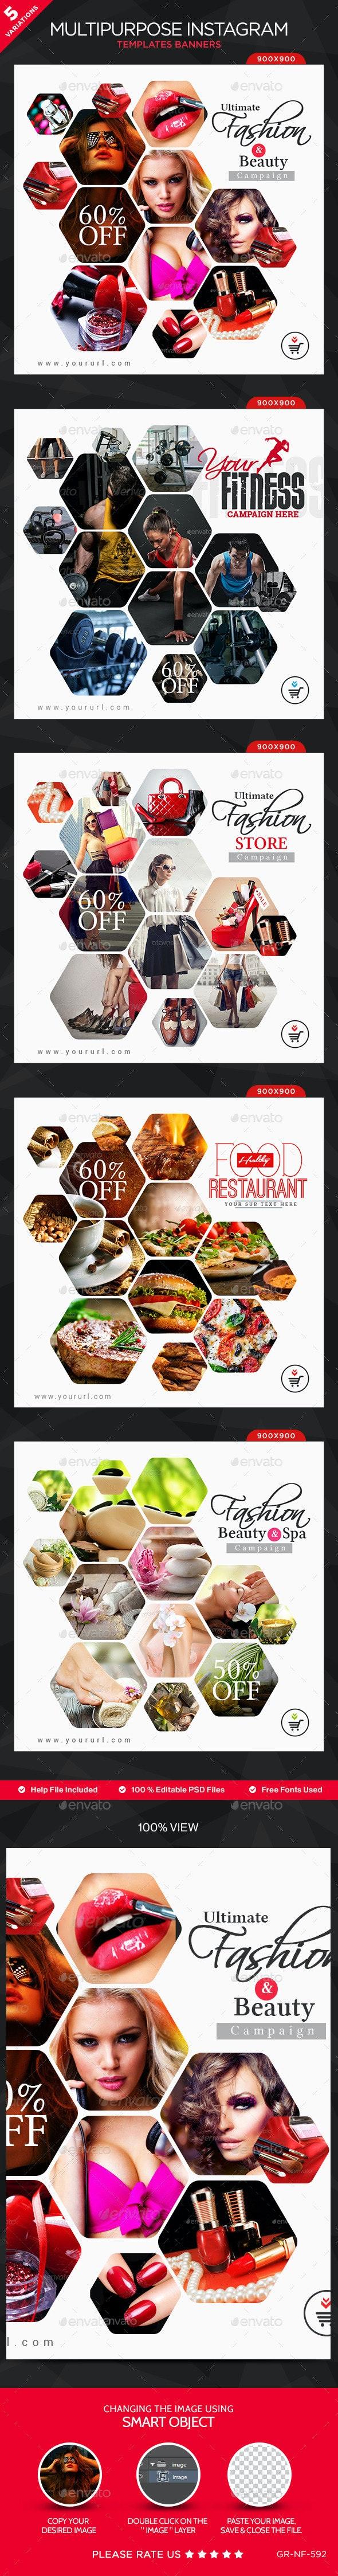 Multipurpose Instagram Templates - 5 Designs - Banners & Ads Web Elements